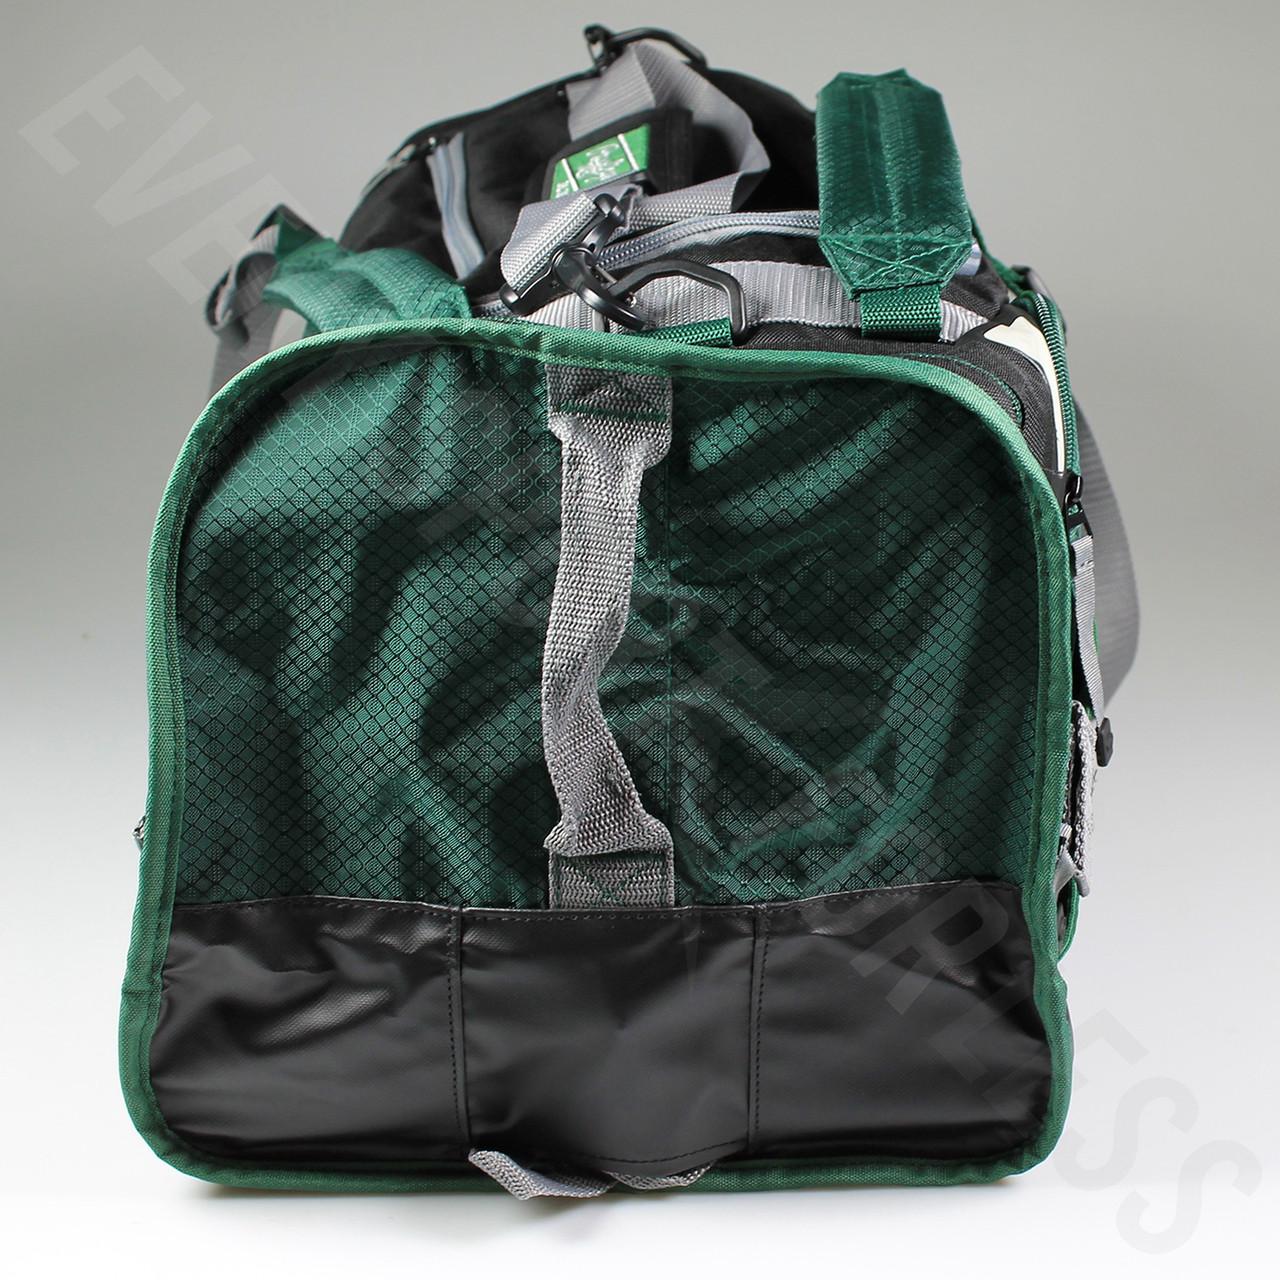 1bf56c14b4 ... Rawlings R601 Hybrid Baseball Backpack   Duffel Bag